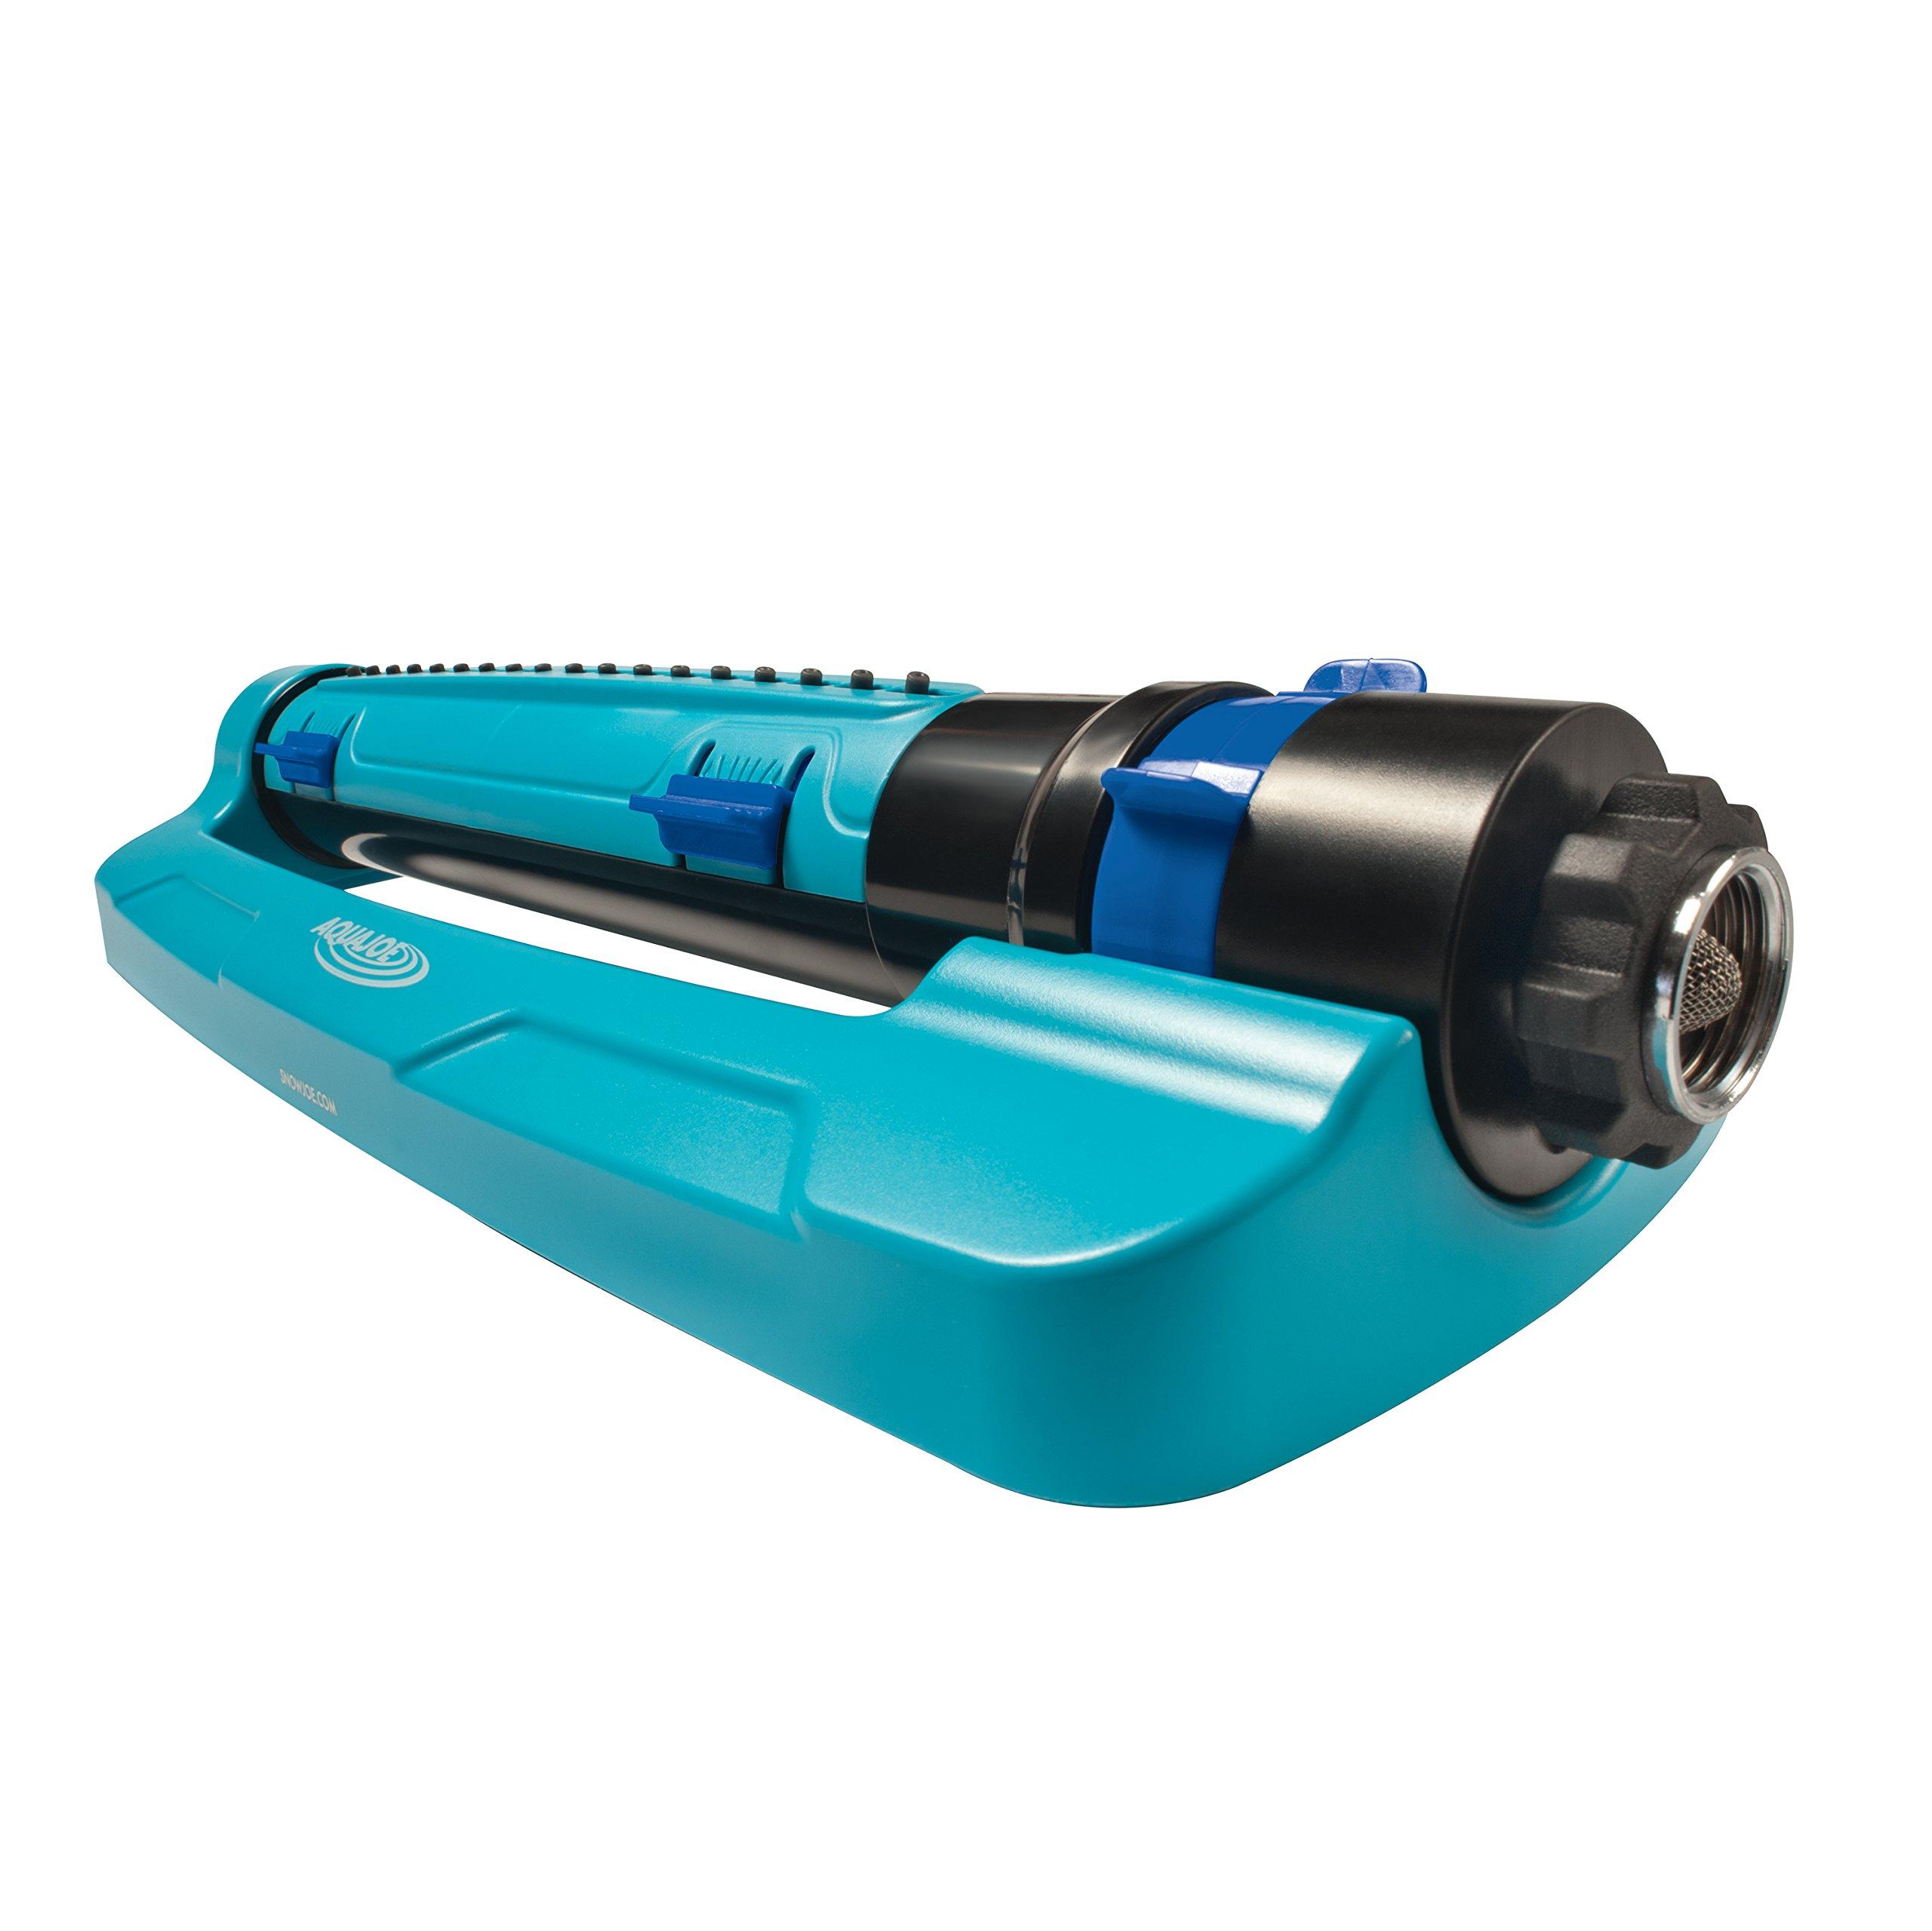 Sun Joe SJI-TLS18 3-Way Oscillation Turbo Oscillation Lawn Sprinkler w/Range, Width, Flow Control